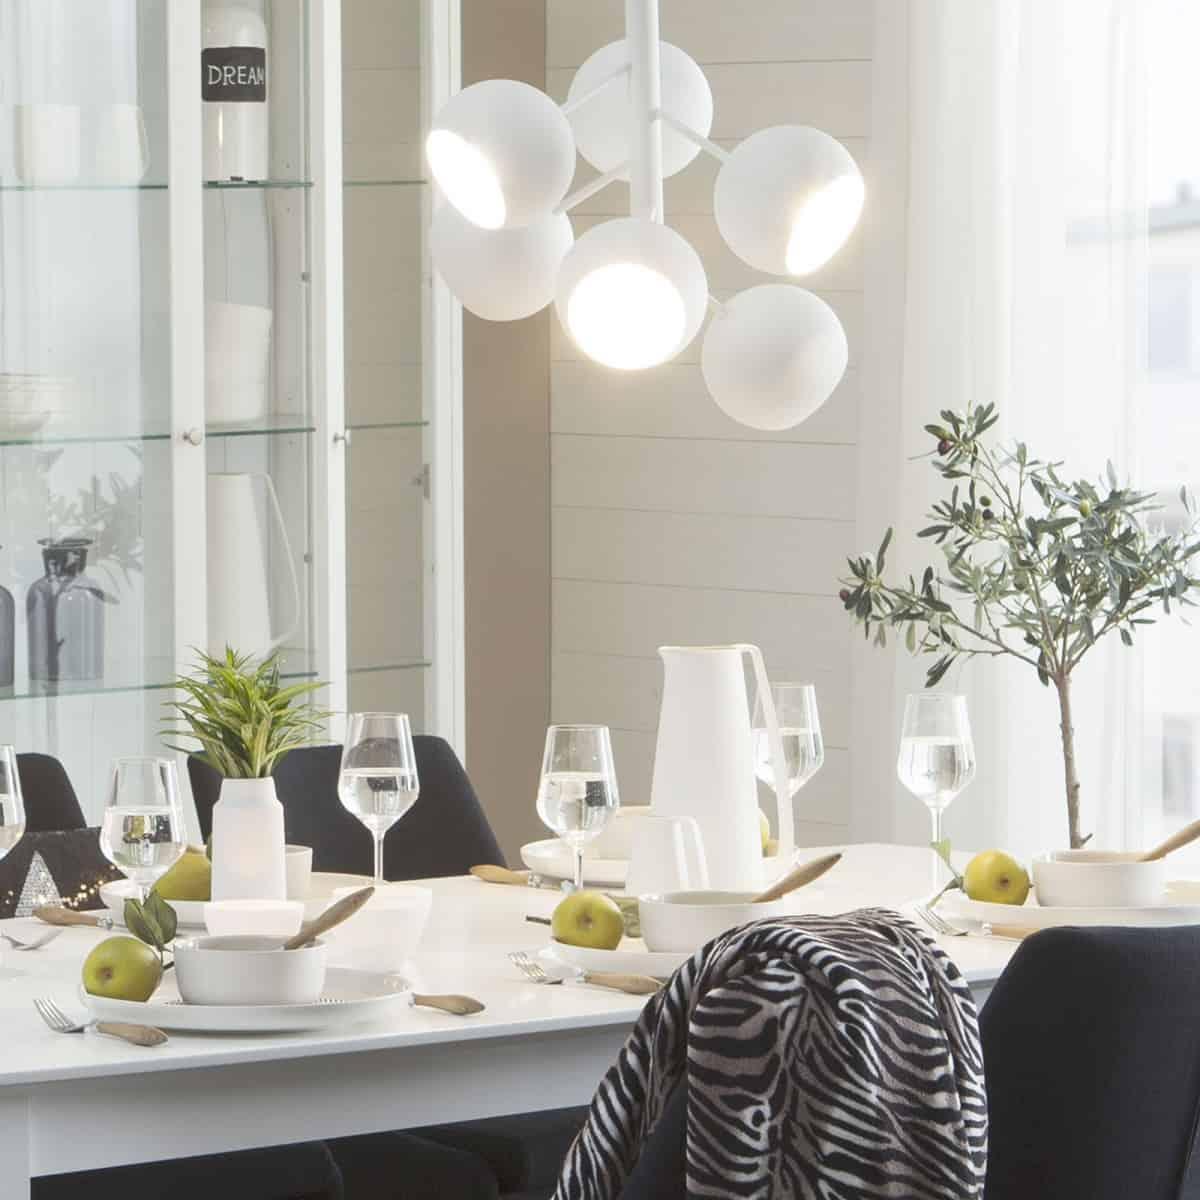 lustra suspendata alba cu sase globuri metalice asezata deasupra unei mese intr-o camera de dining decorata cu alb, crem, negru si verde